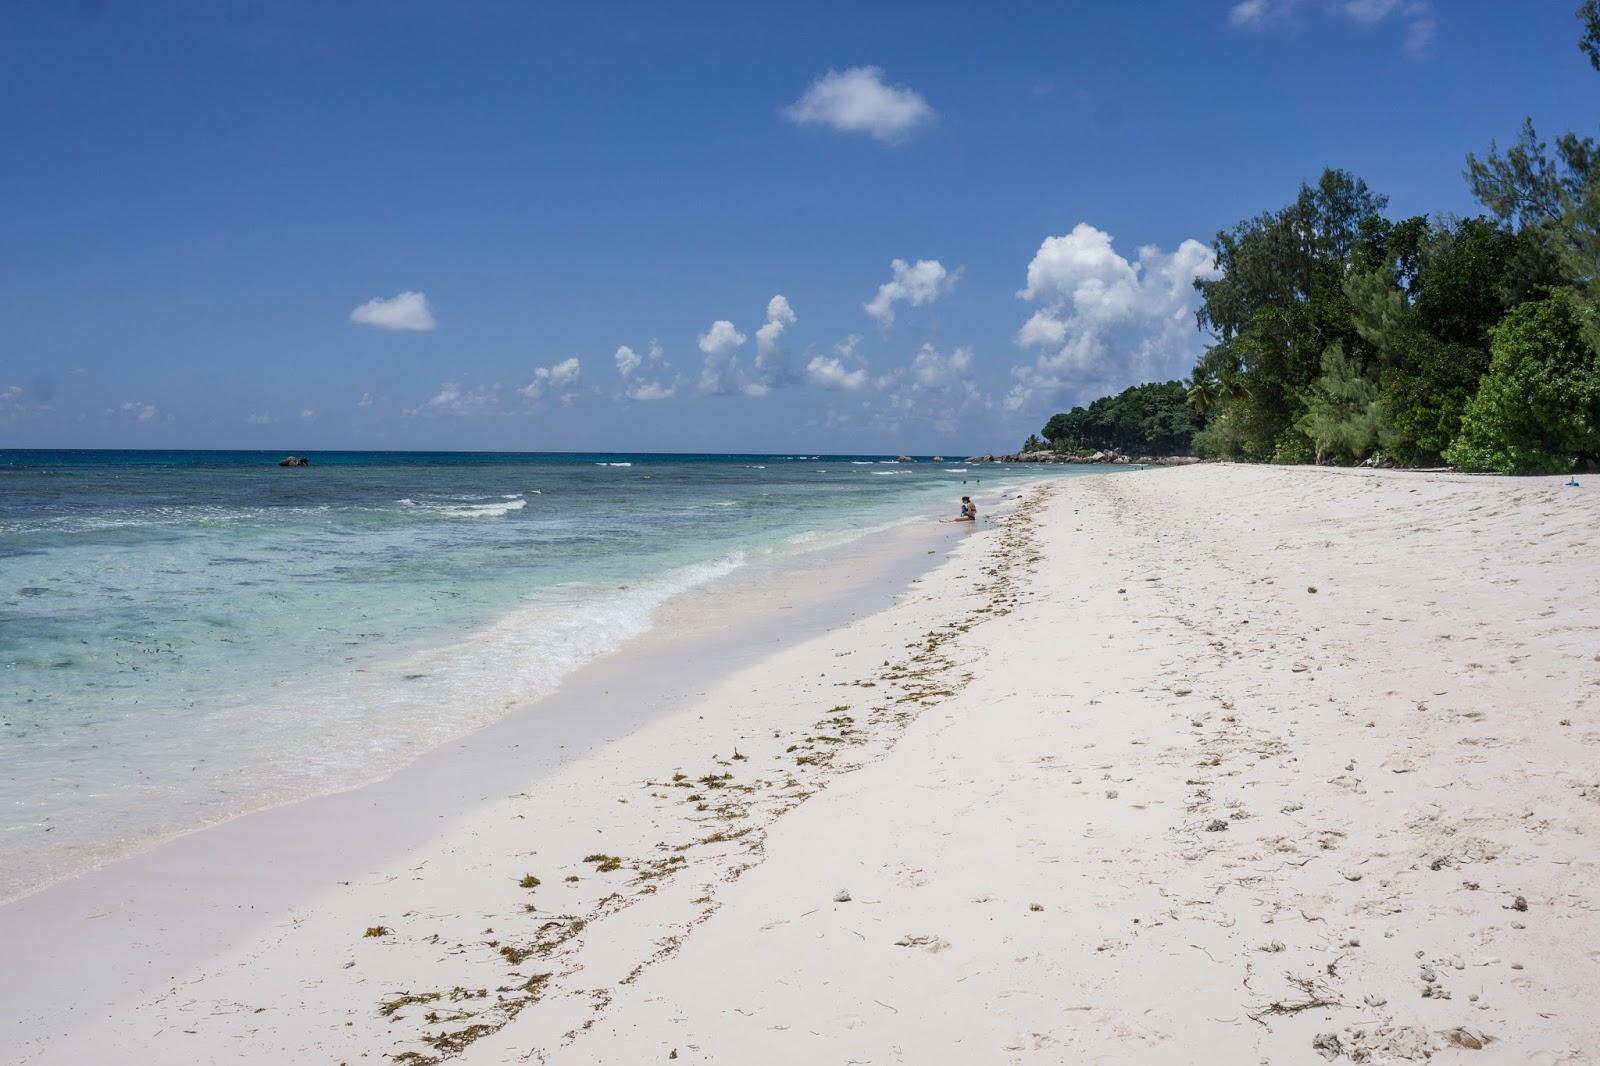 Seychelles, Seychelles island, La Digue, paradise beach, Seychelles no filter, travel blog